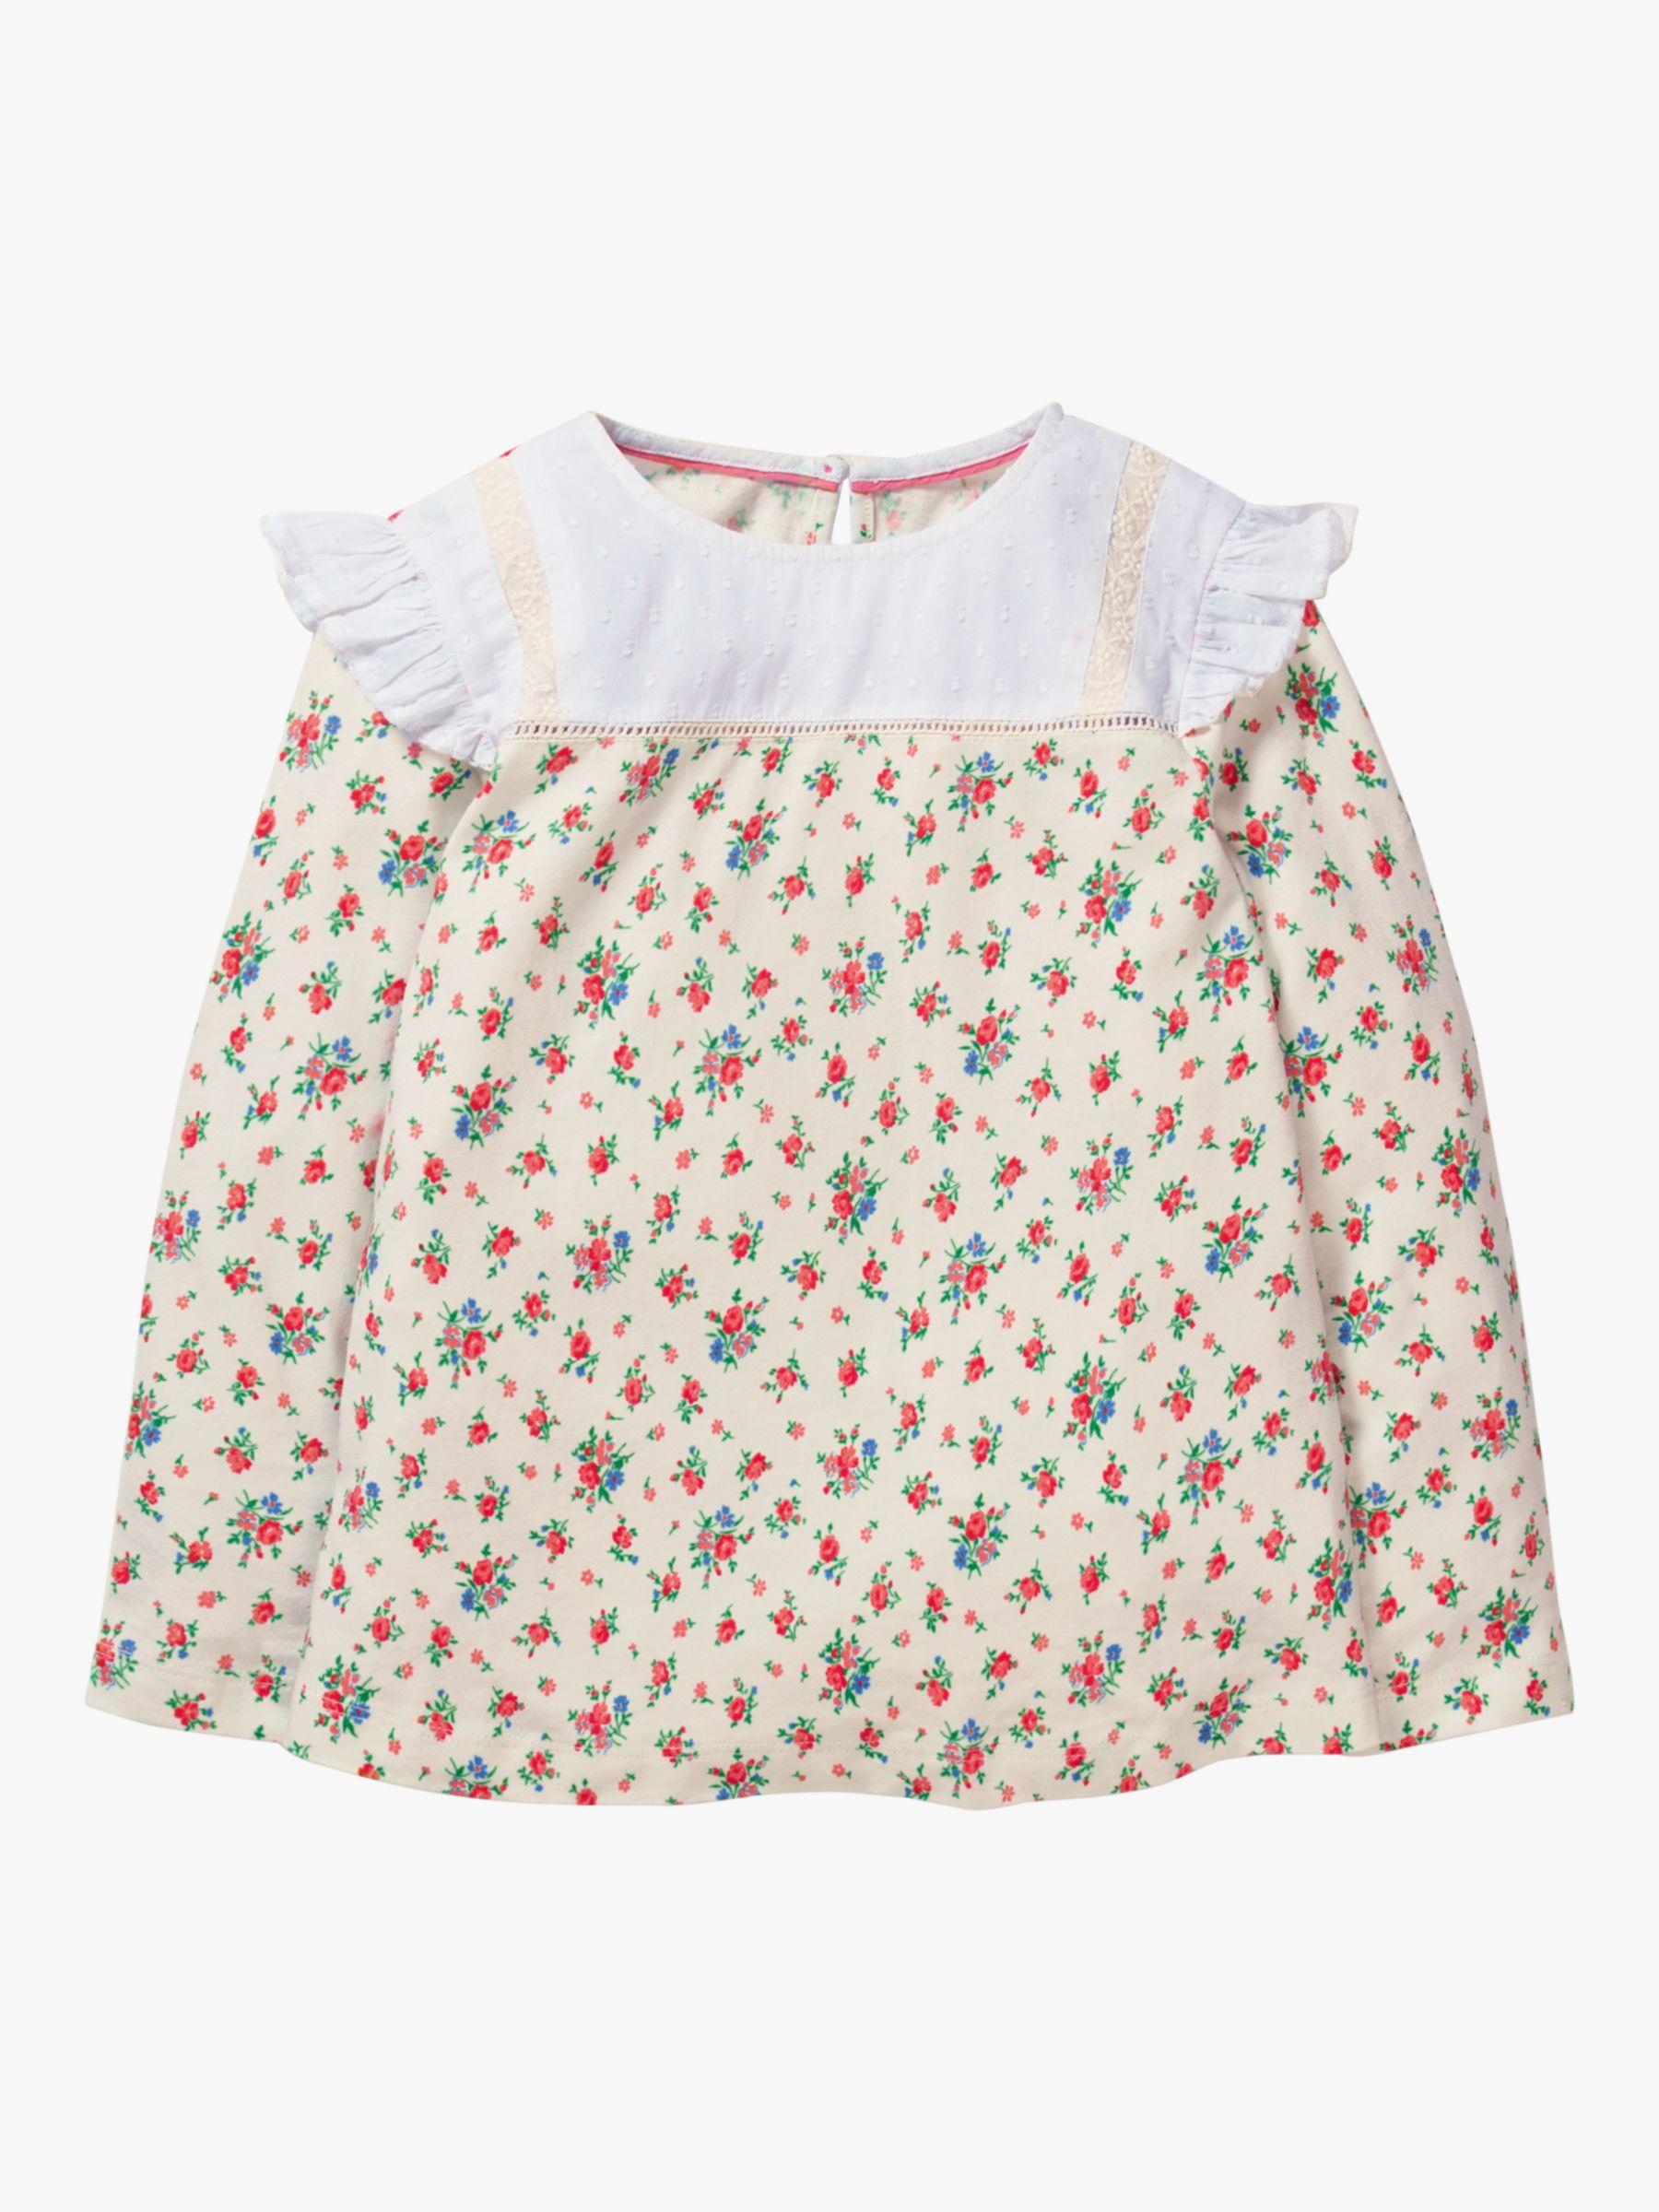 Mini Boden Mini Boden Girls' Frilly Jersey Top, Vintage Rose